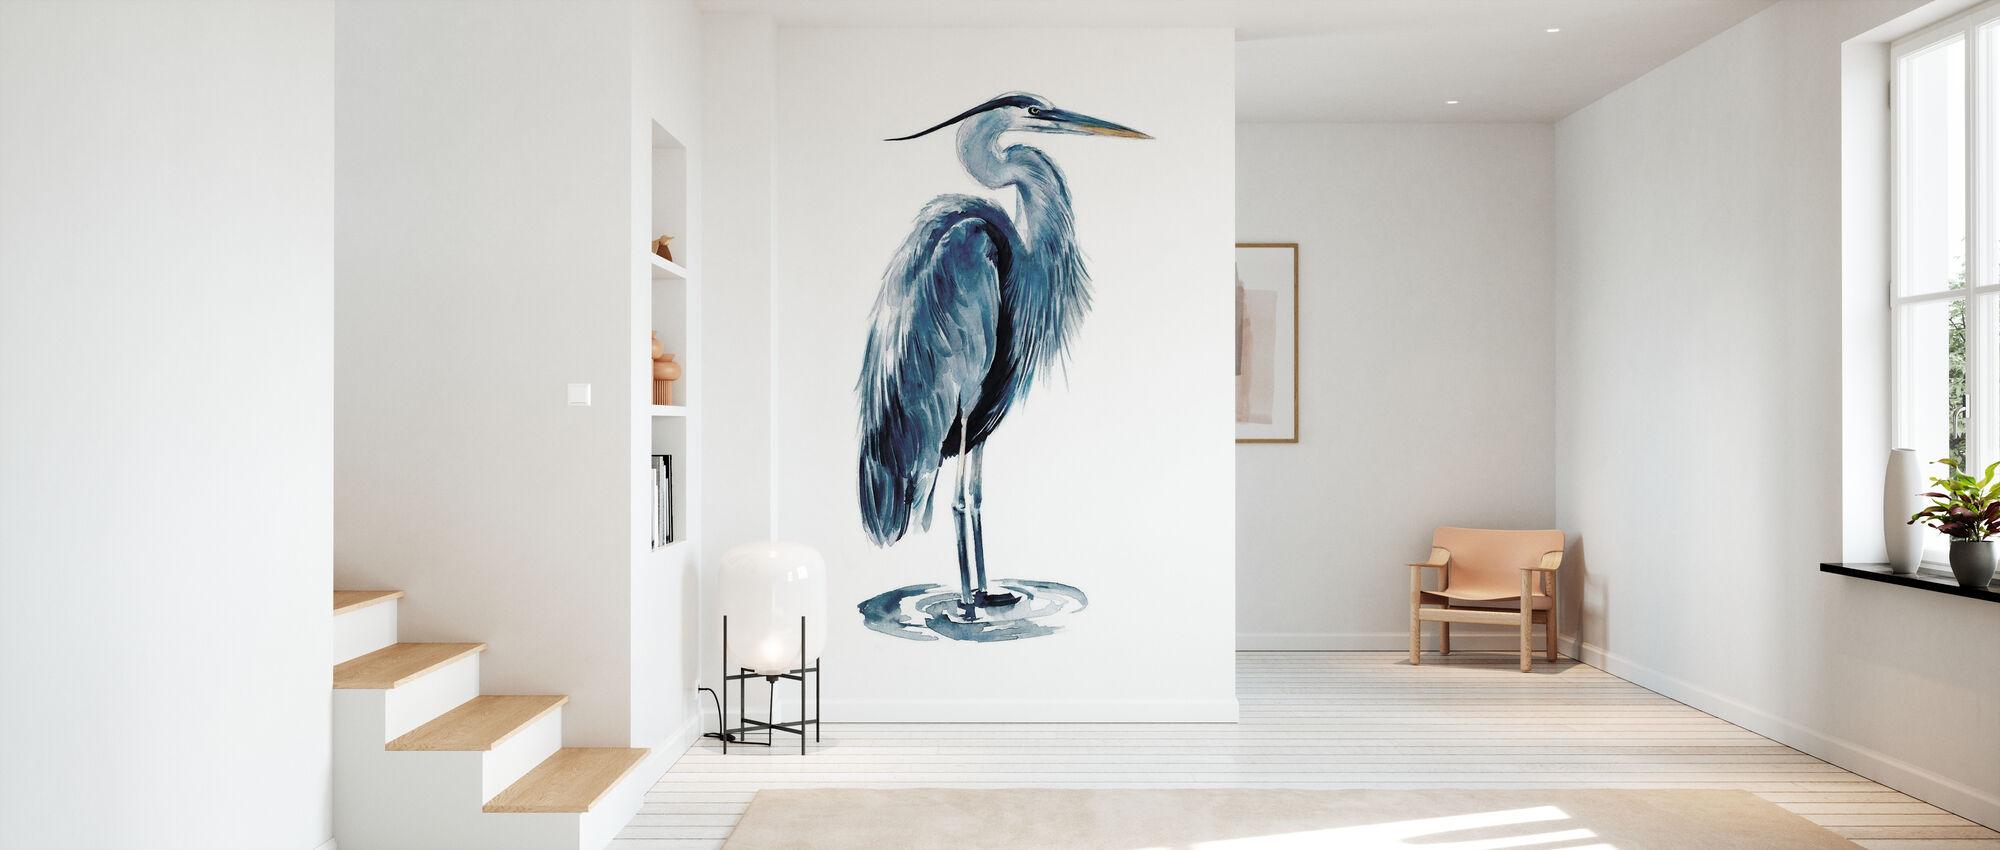 Blue Blue Heron - Wallpaper - Hallway